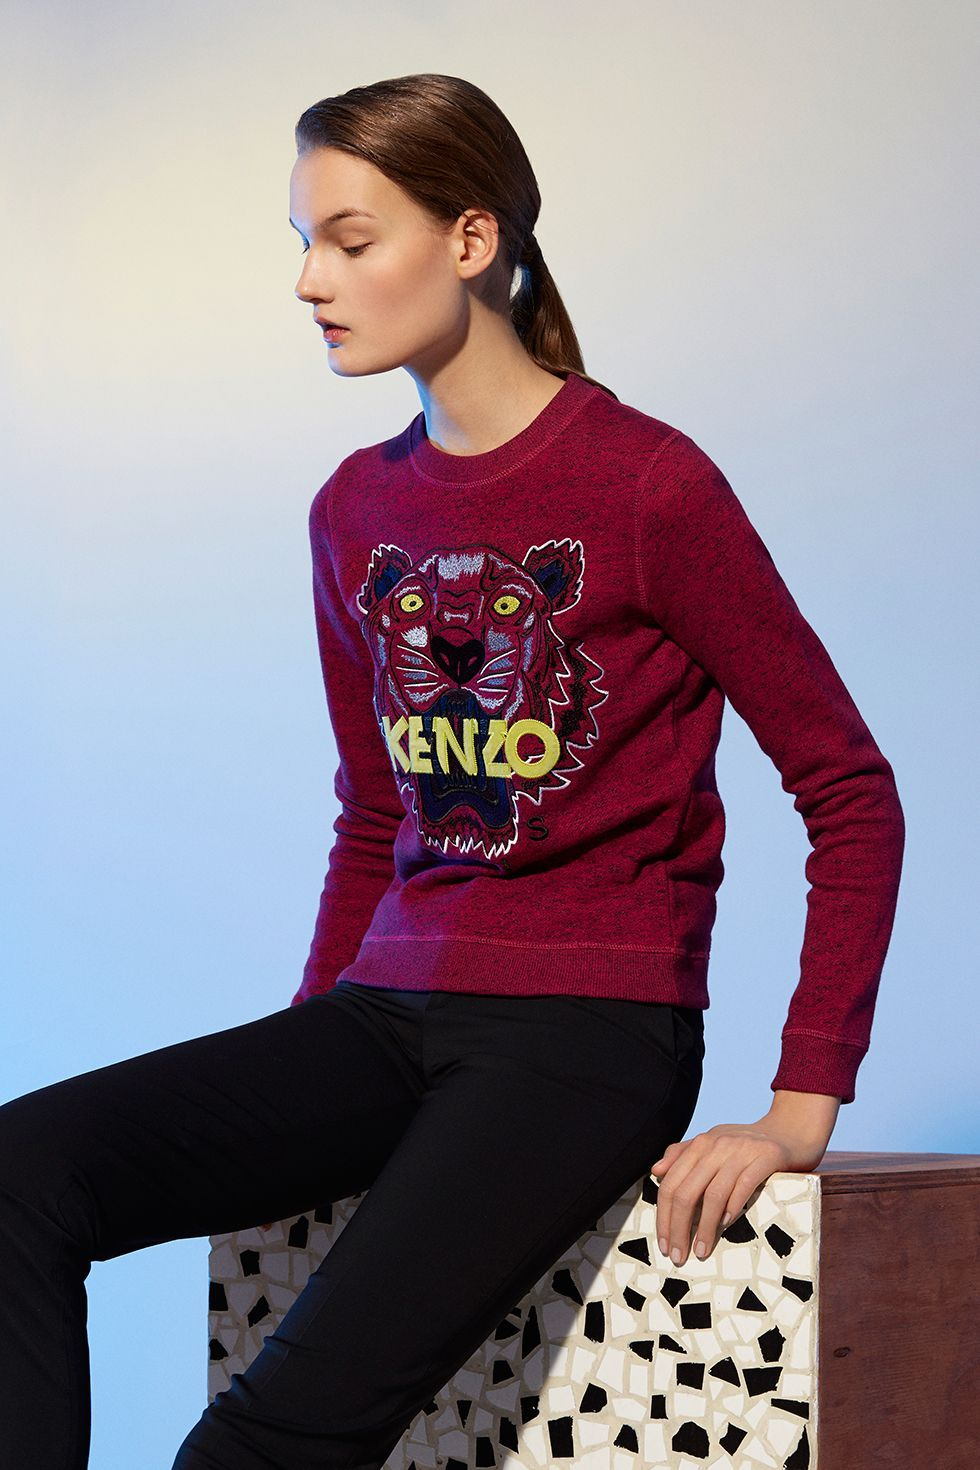 Kenzo Tiger Sweatshirt - Kenzo Sweatshirts   Sweaters Women - Kenzo E-shop b53c758200